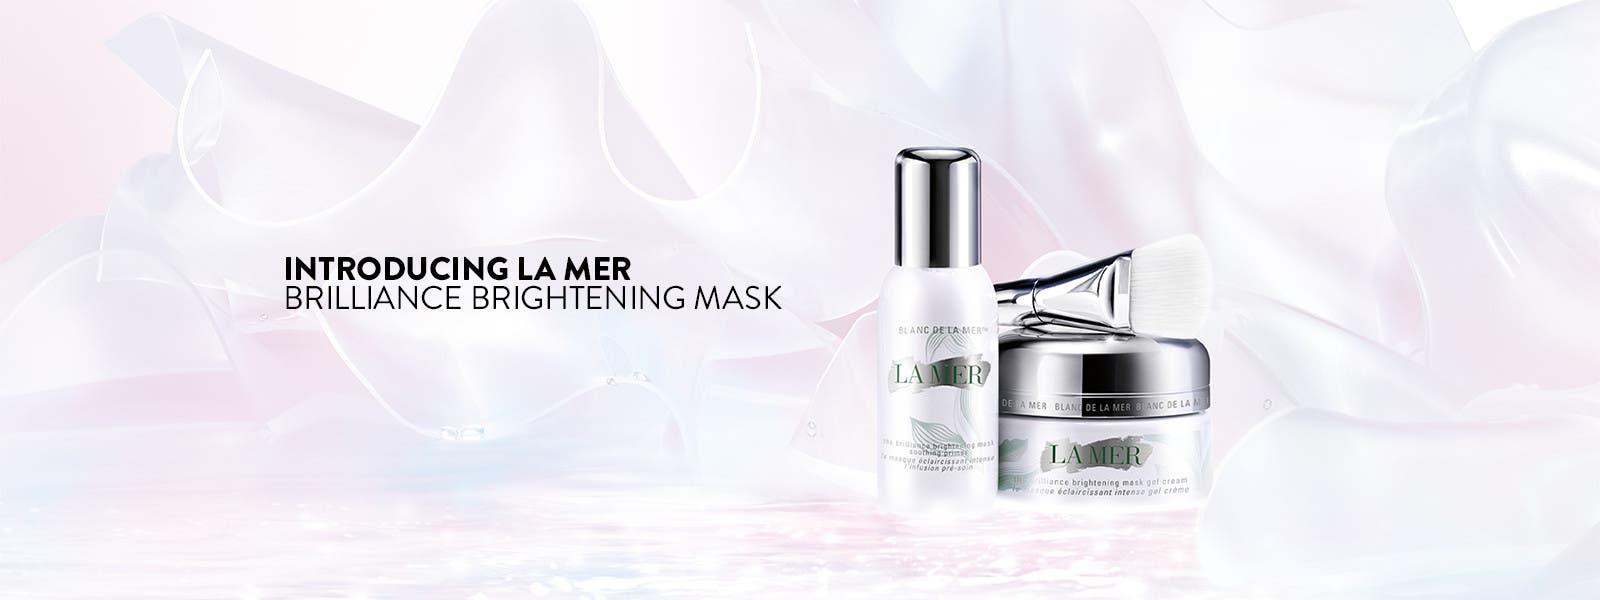 Introducing La Mer Brilliance Brightening Mask.